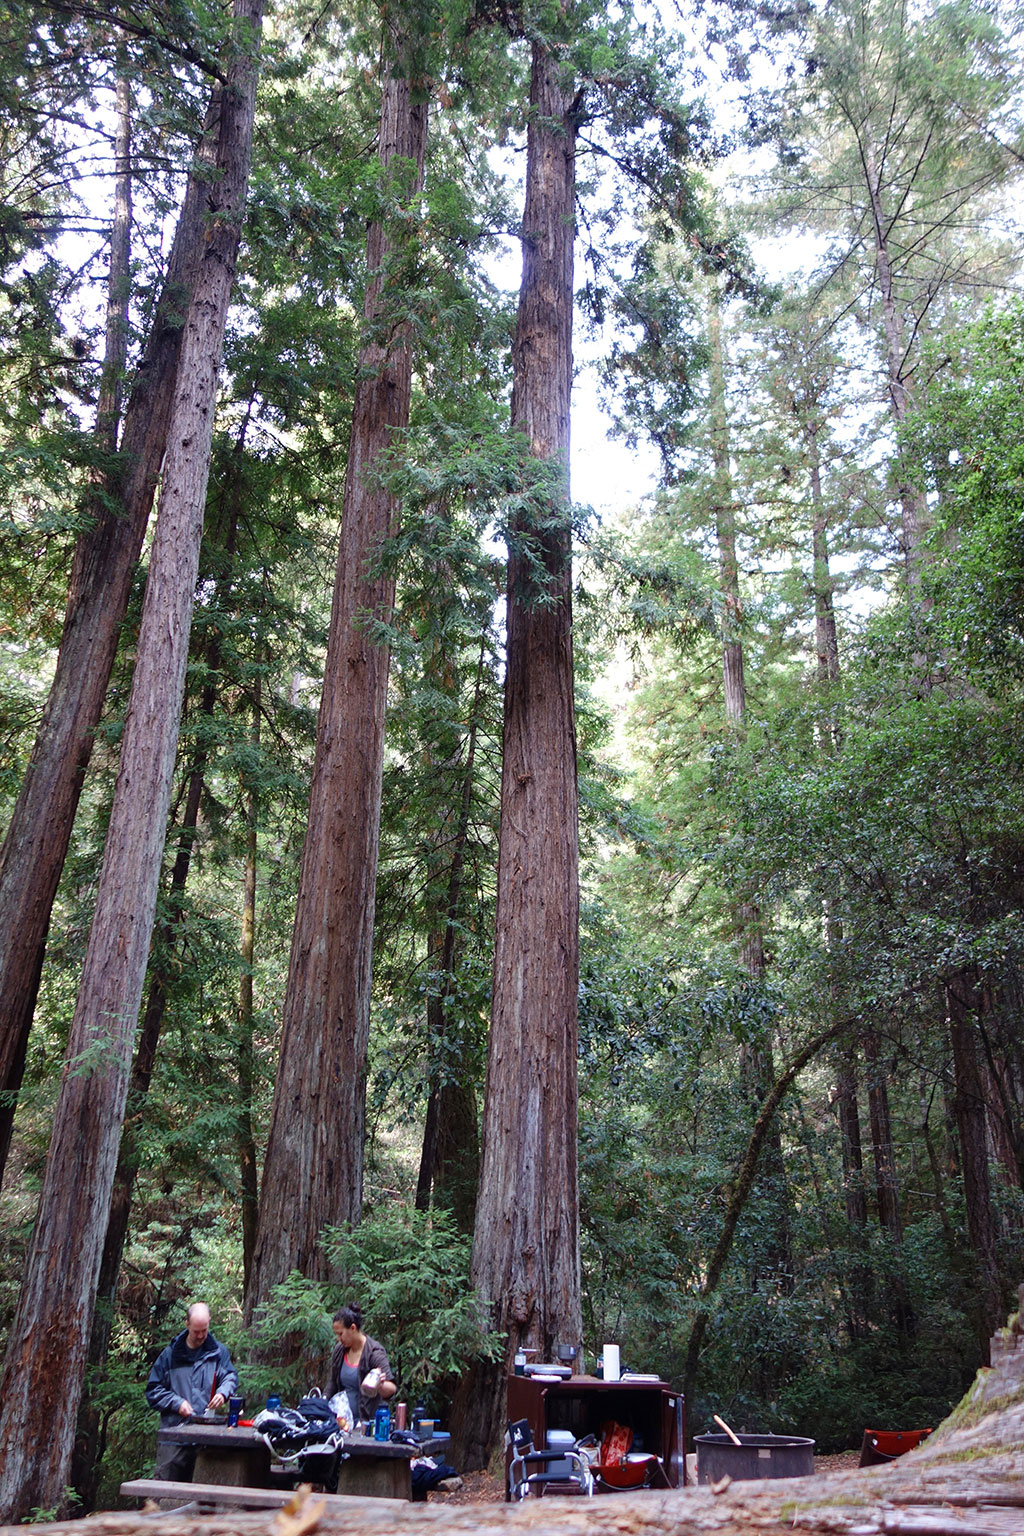 Portola Redwood State Park